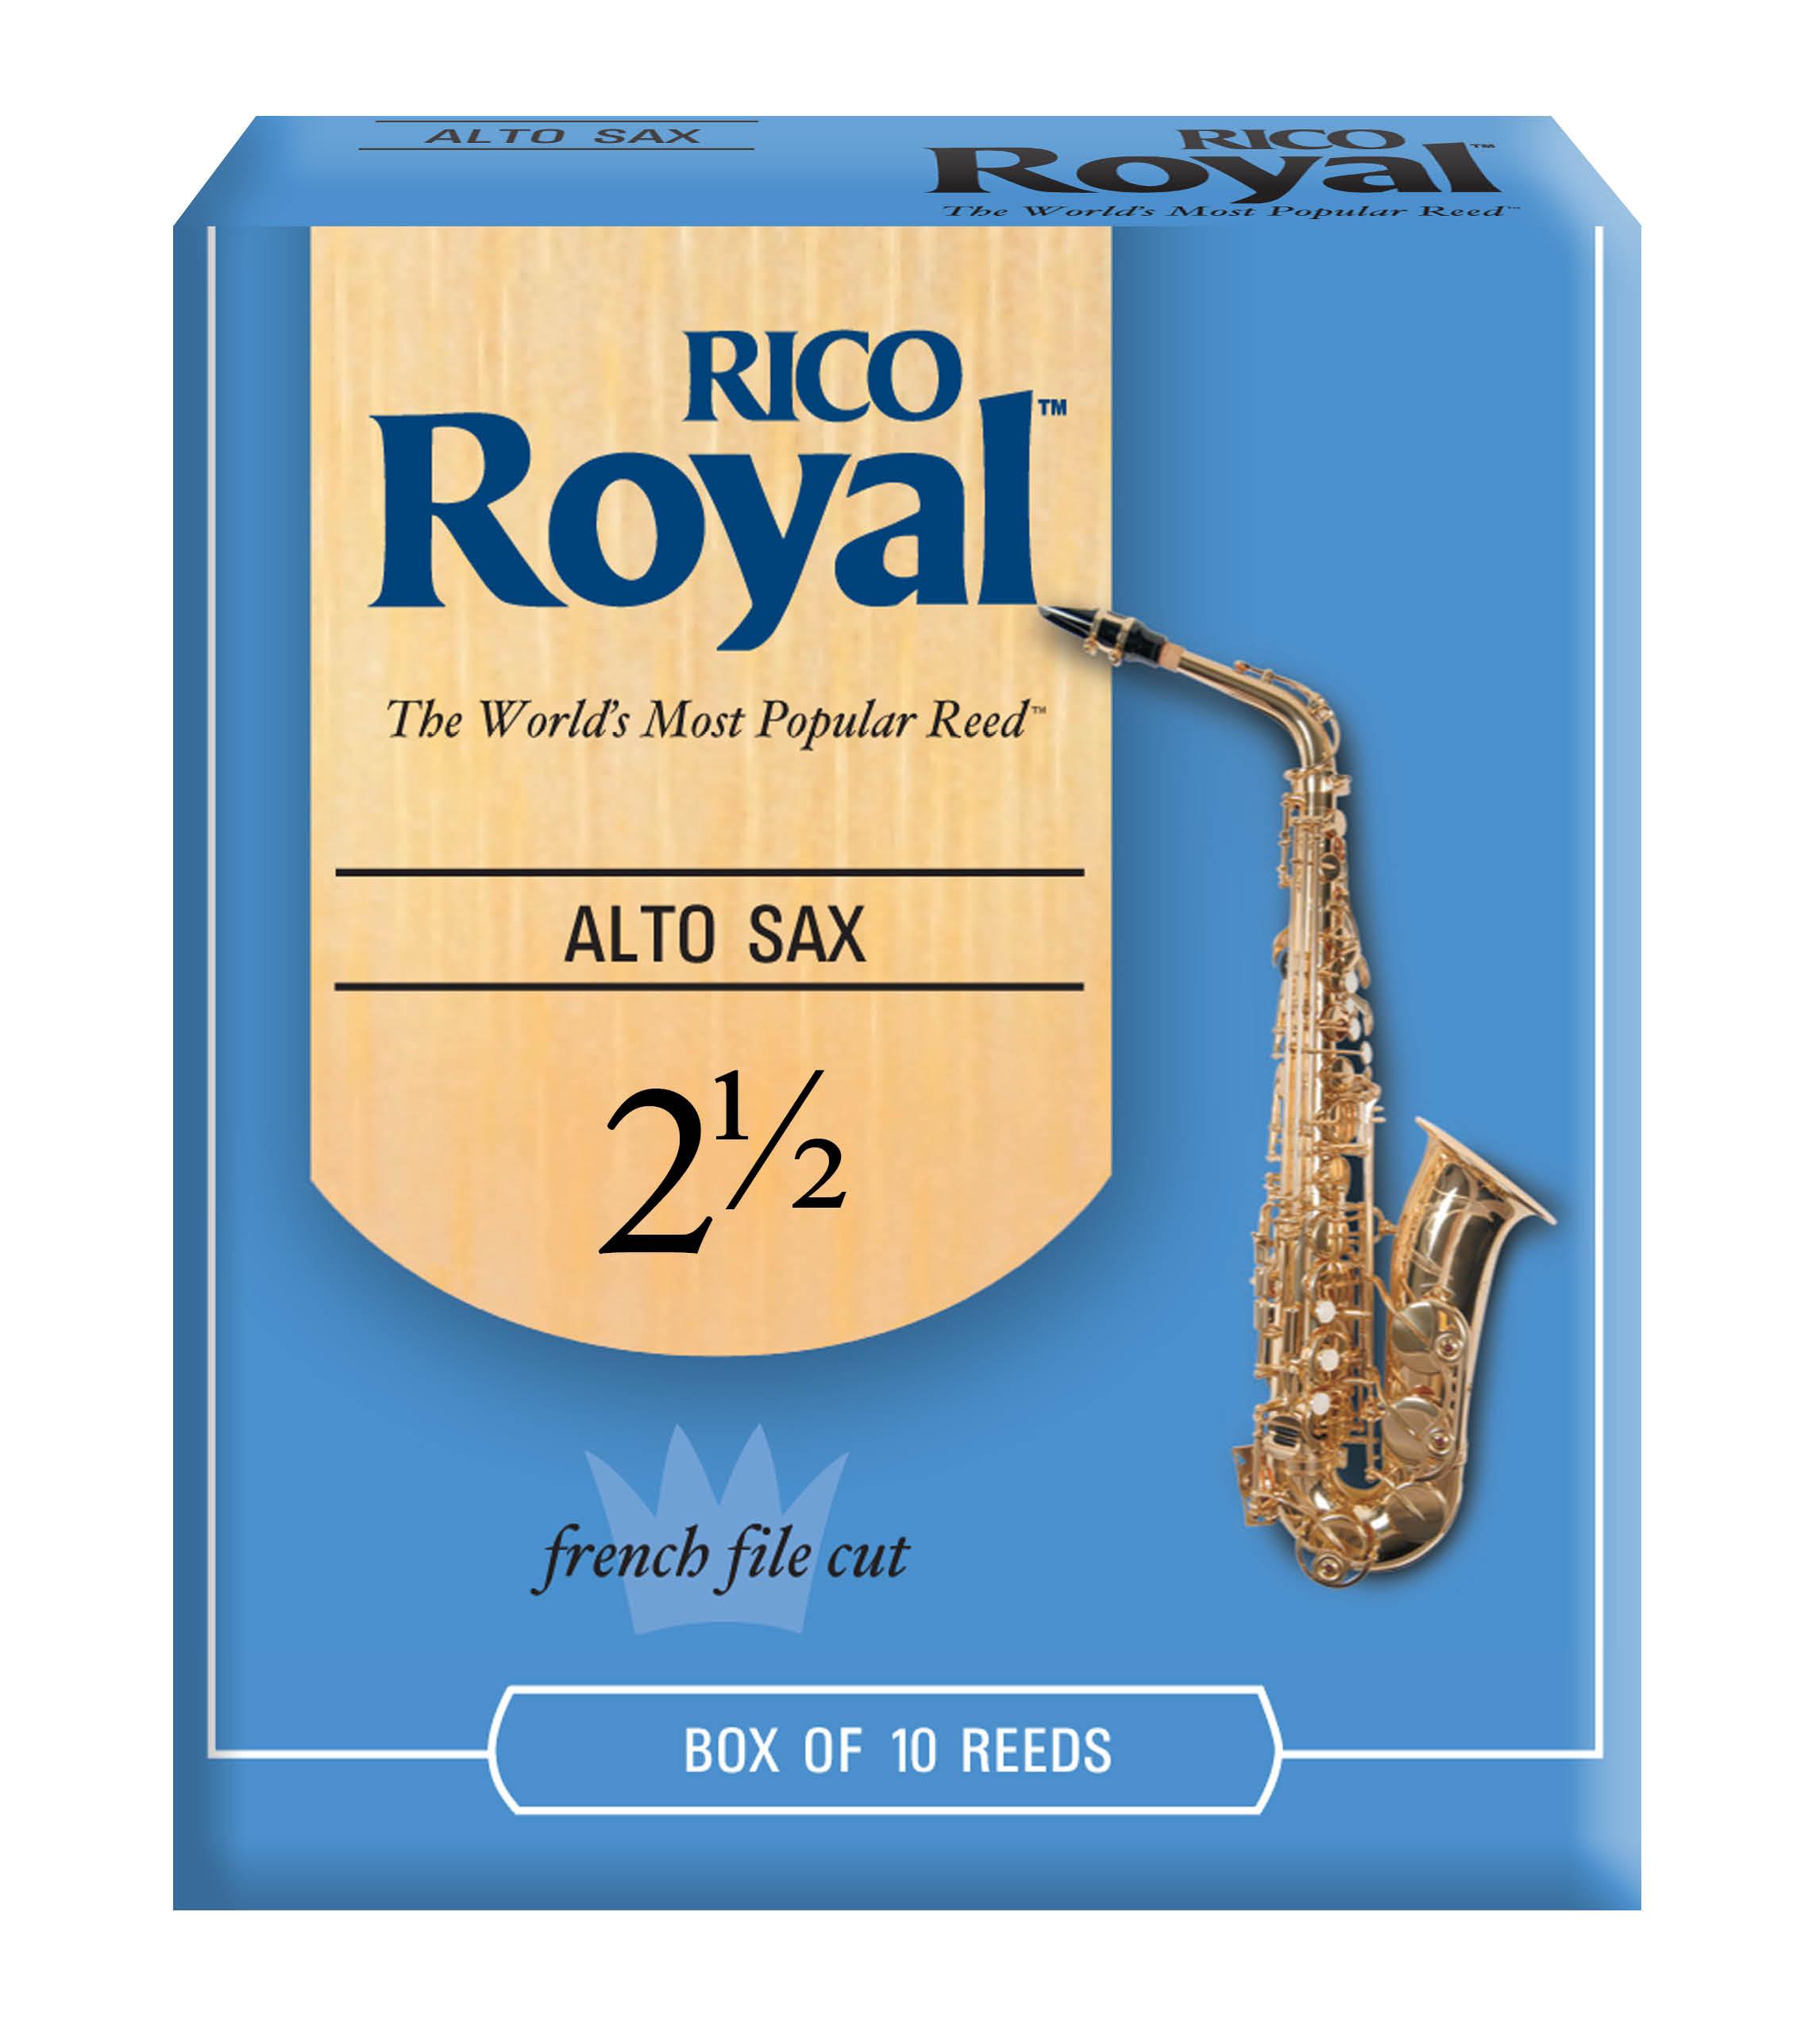 RICO ROYAL 2.5 ALTO SAX REED 10